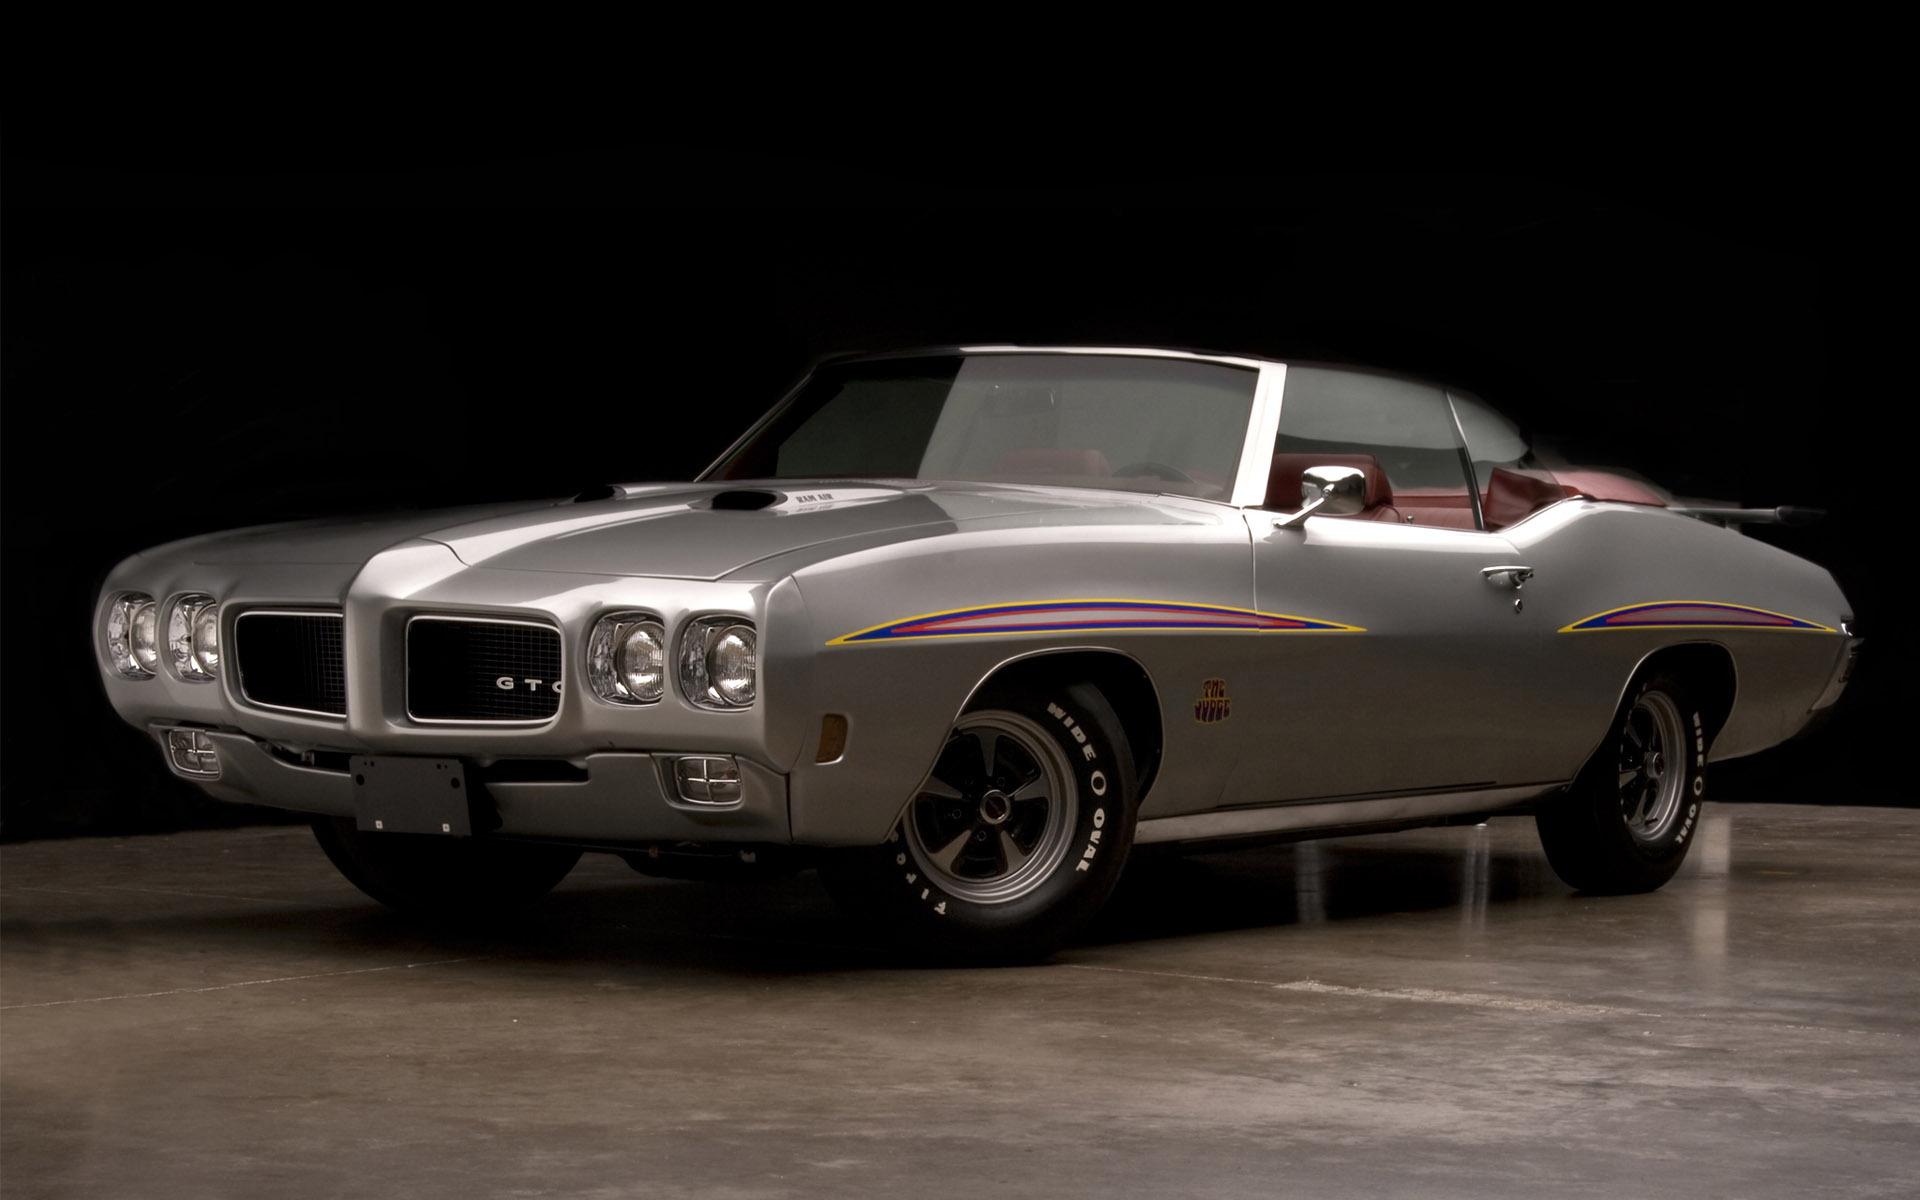 1970 Pontiac GTO wallpaper 19509 1920x1200